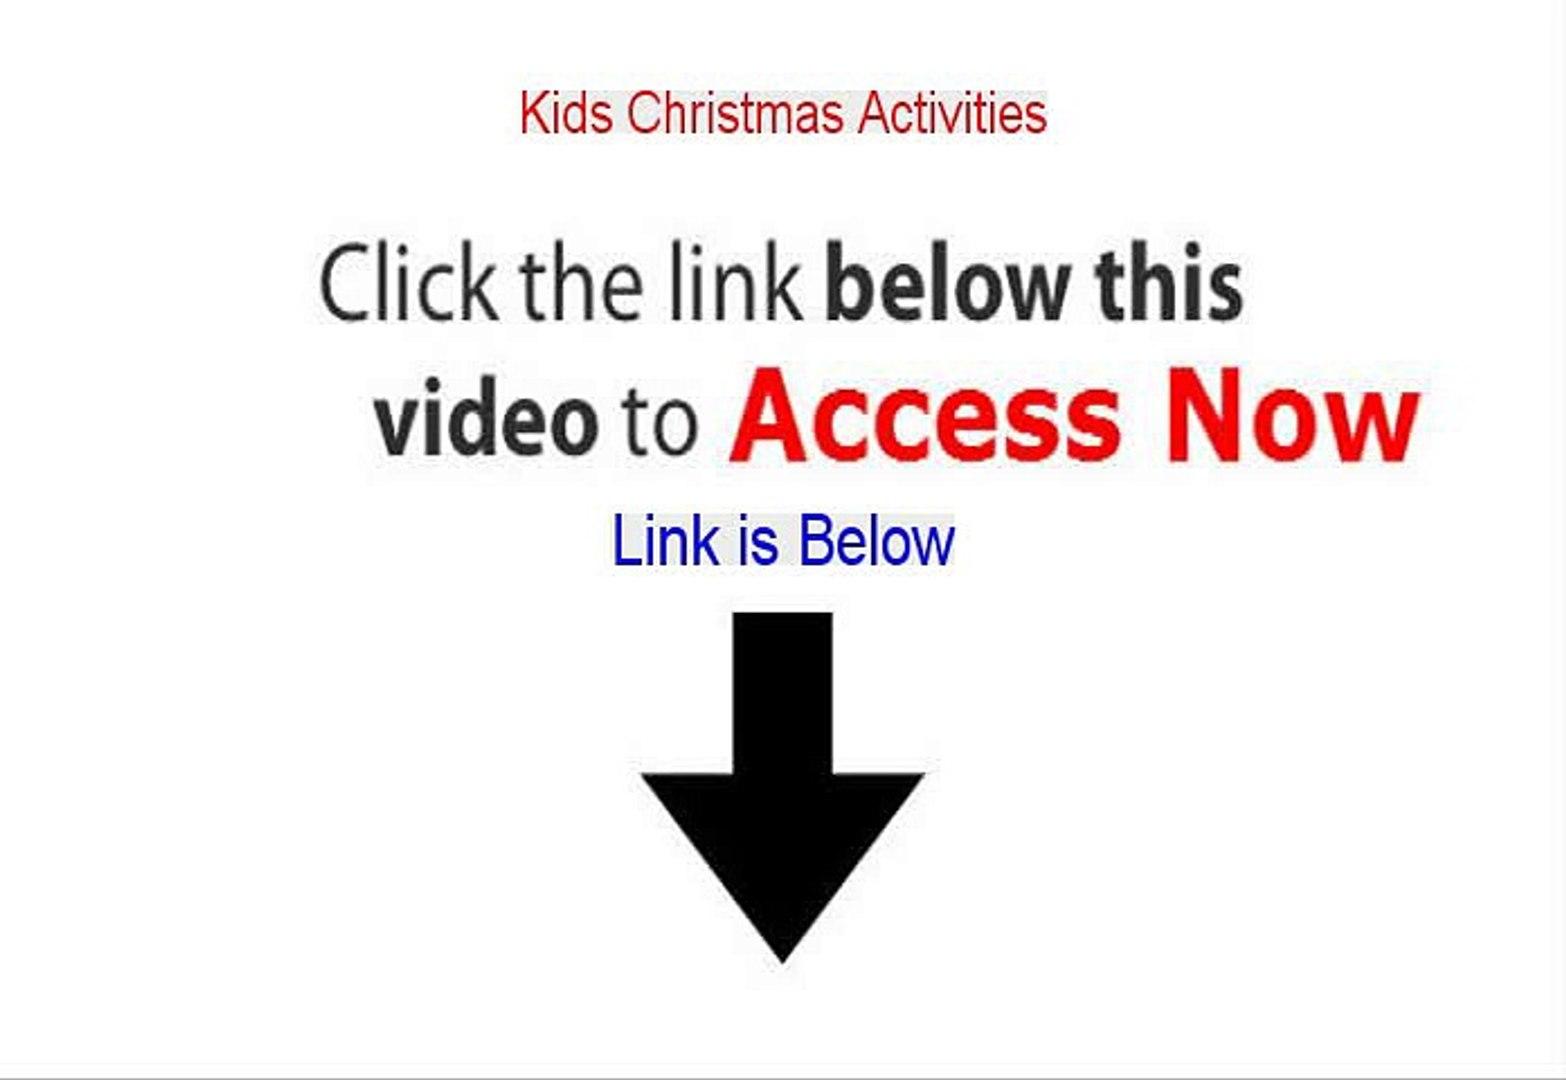 Kids Christmas Activities Reviewed - Kids Christmas Activitieskids christmas activities